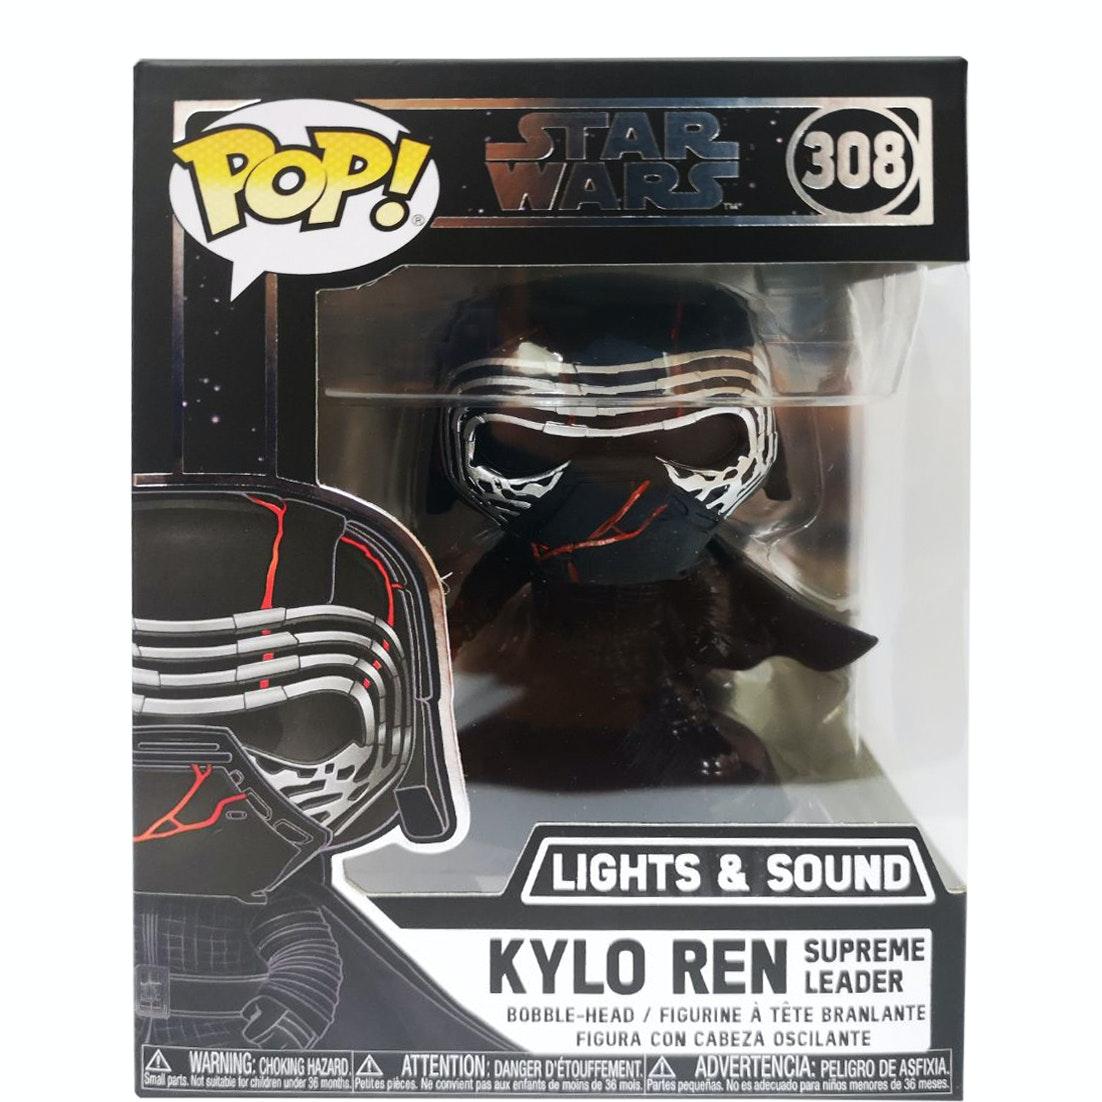 MINT Kylo Ren Supreme Leader #308 Star Wars Funko Pop Bobble-Head